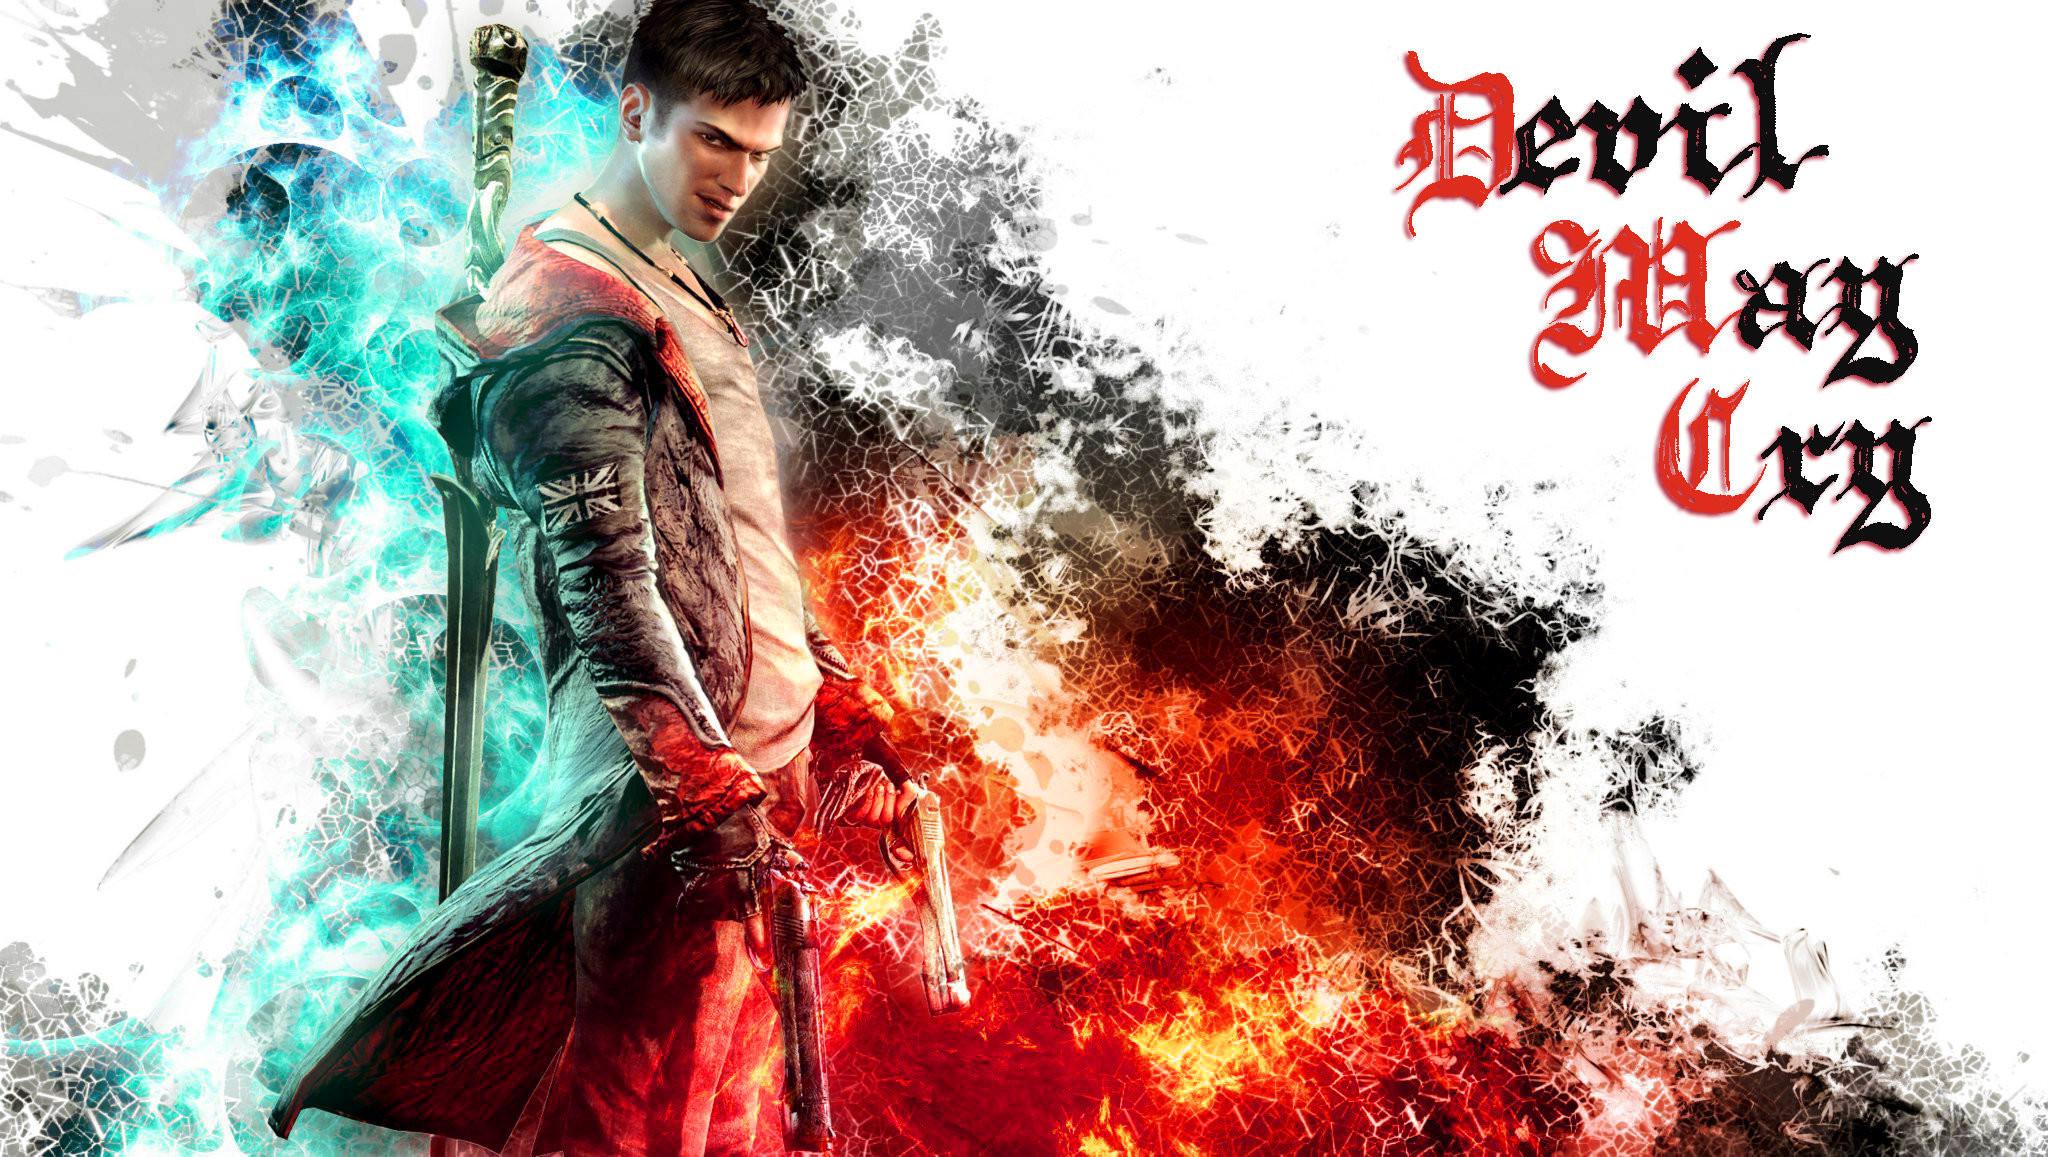 Devil May Cry Dante Wallpaper: Devil May Cry 5 Wallpaper ·①